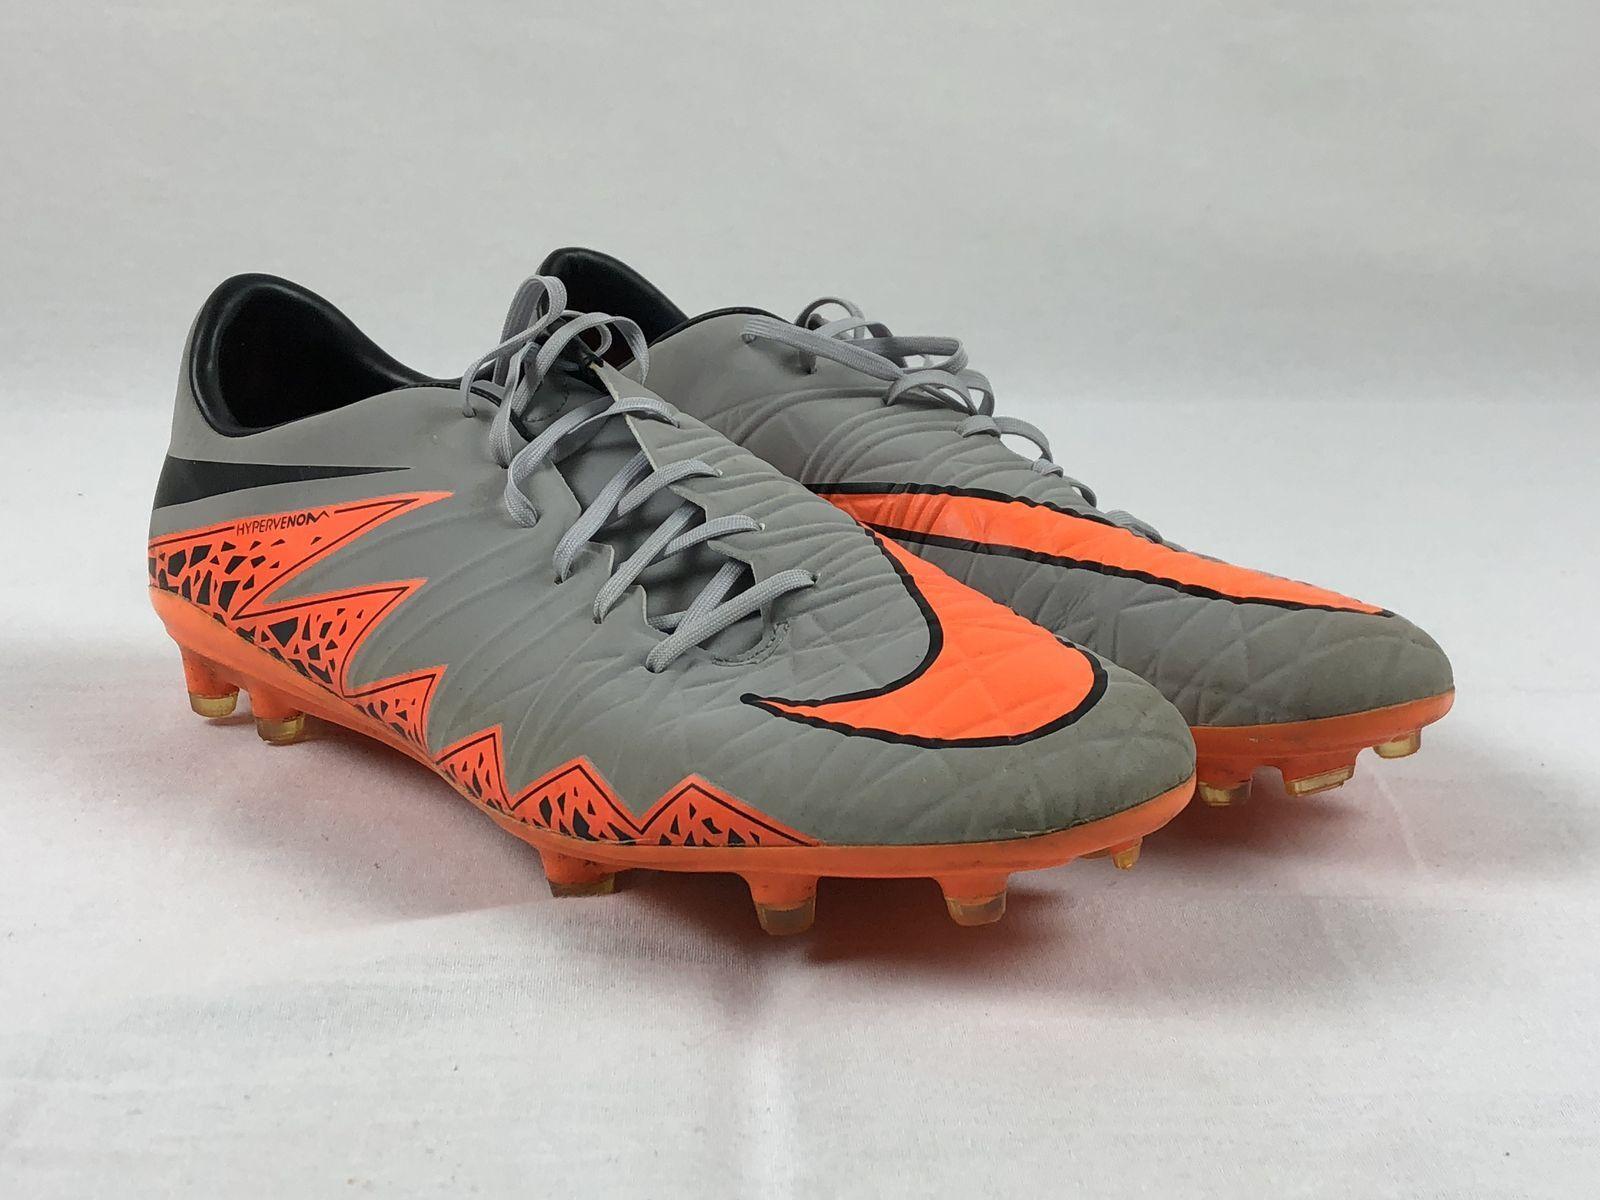 Nike - veleno veleno veleno - grigio / orange scarpette (uomini '12) - usa b9d8a2